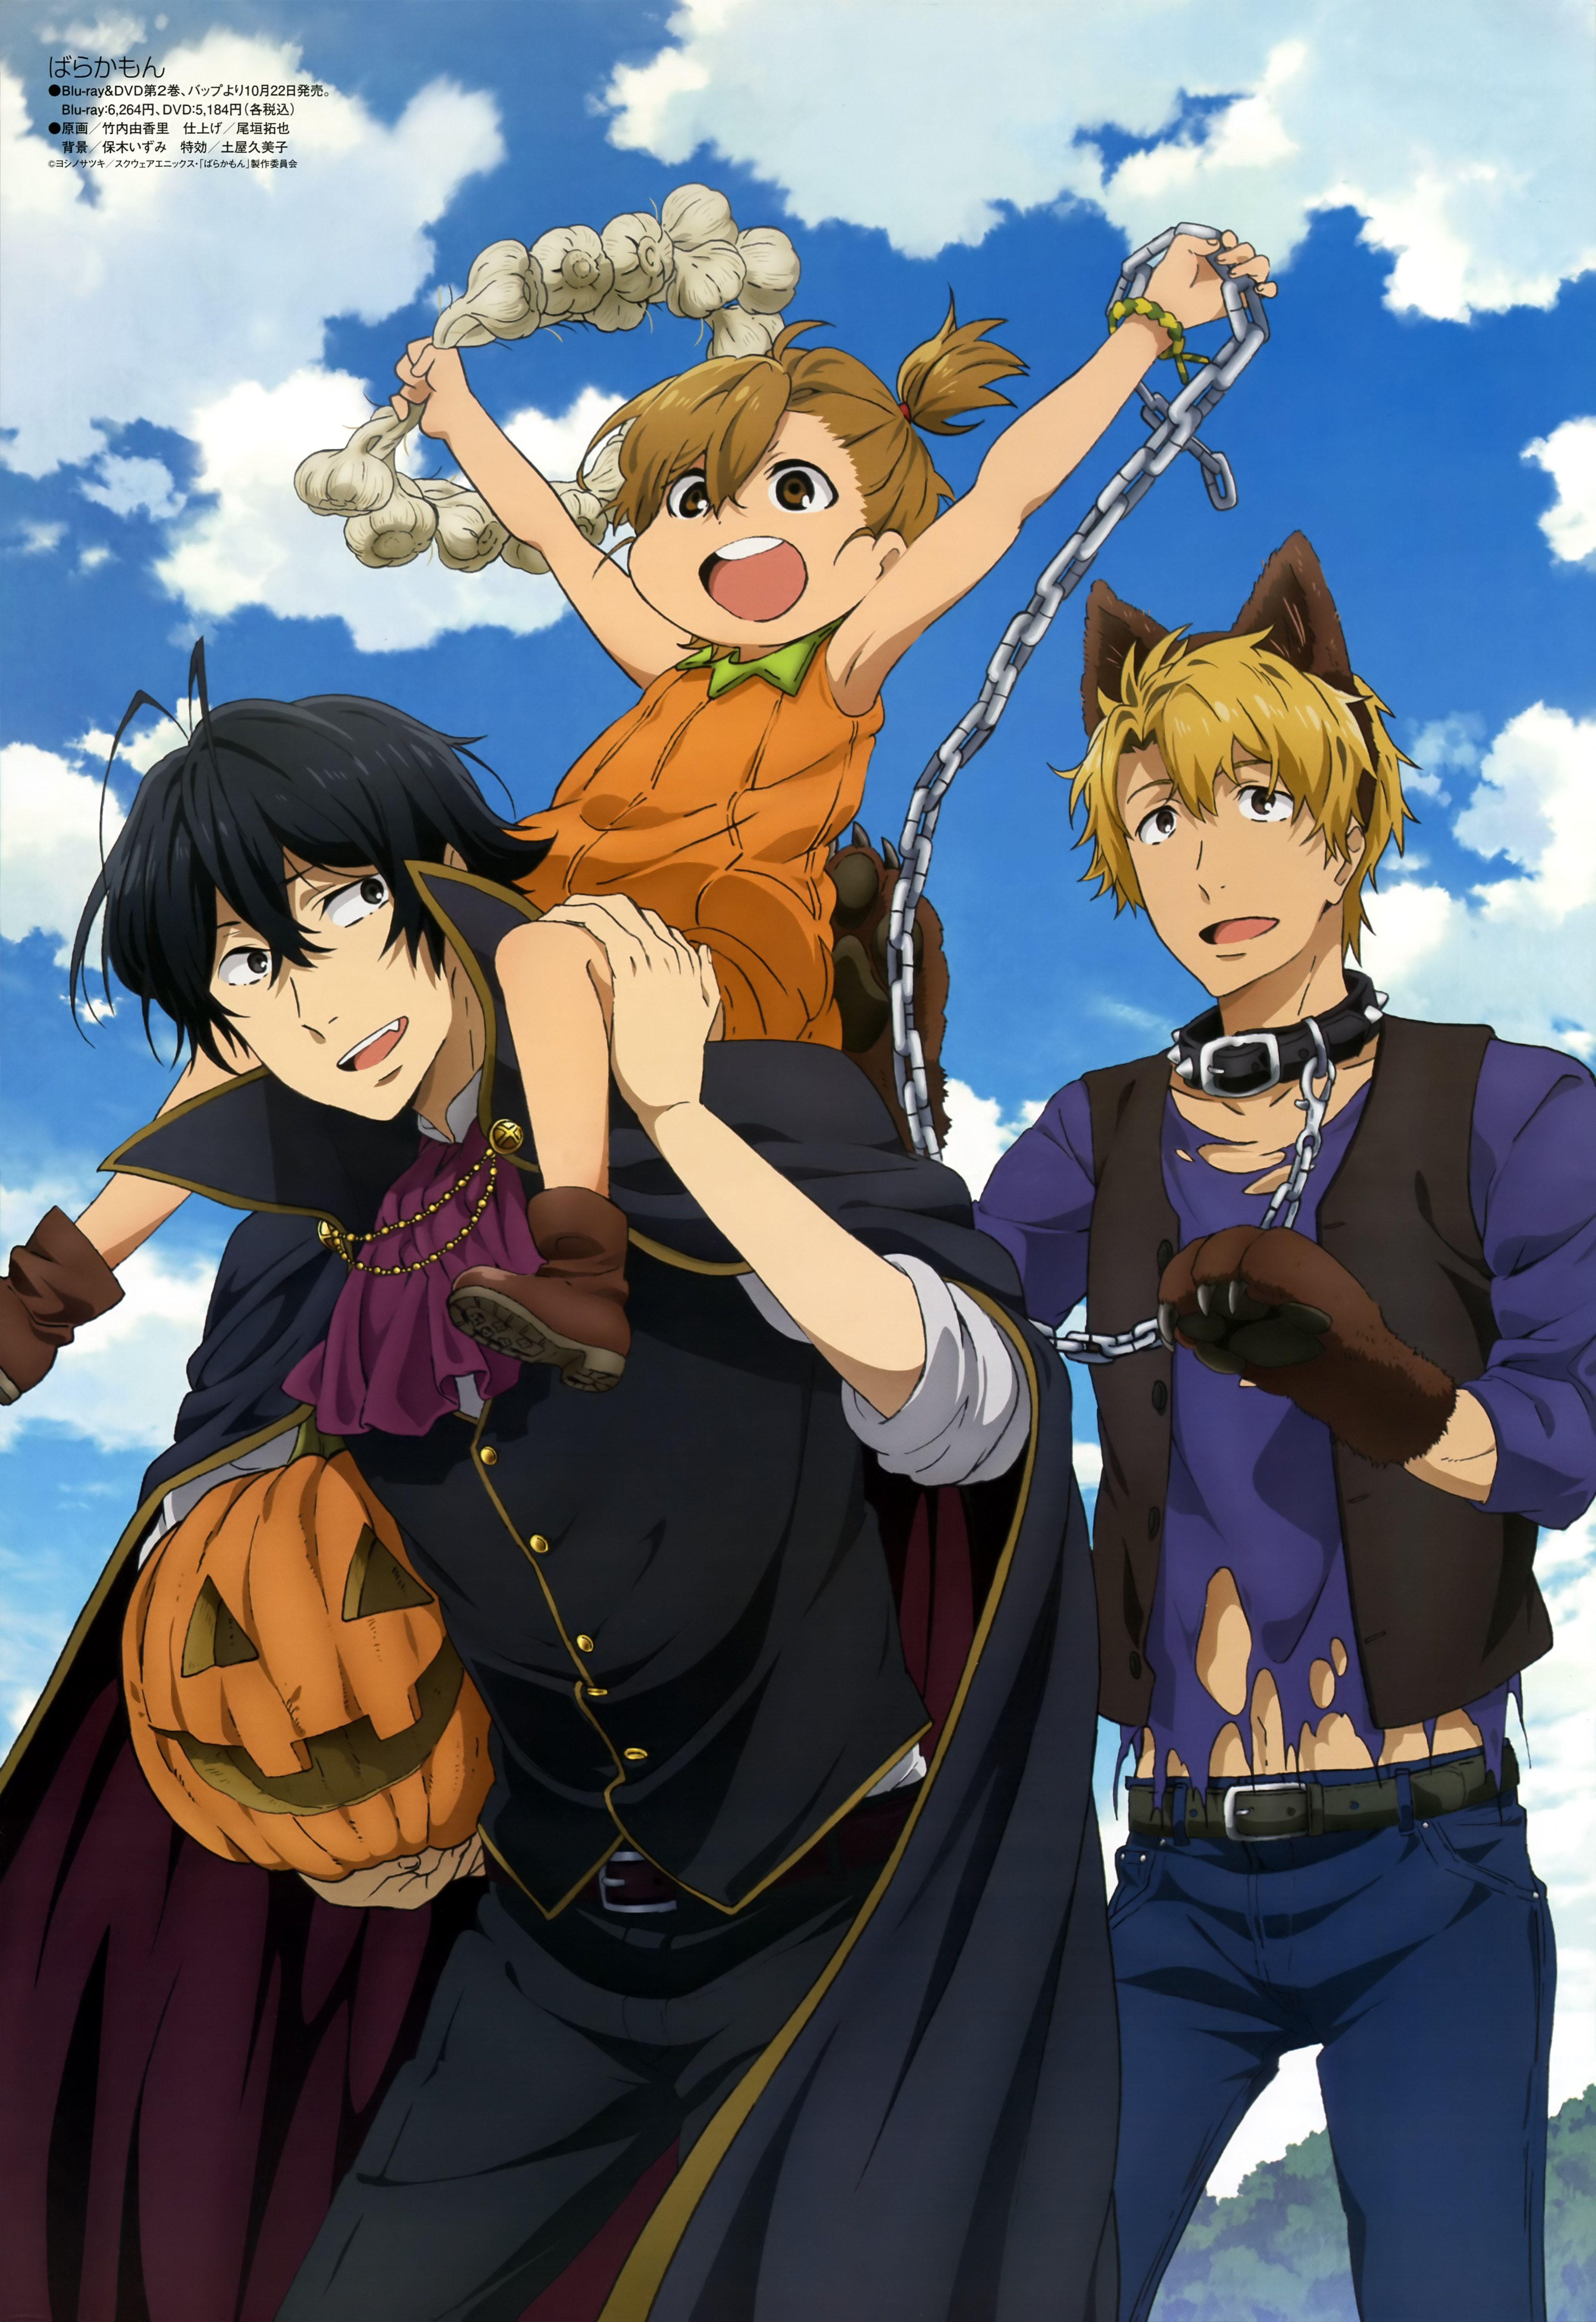 [Summer 2014] Barakamon Barakamon, Anime, Good anime series